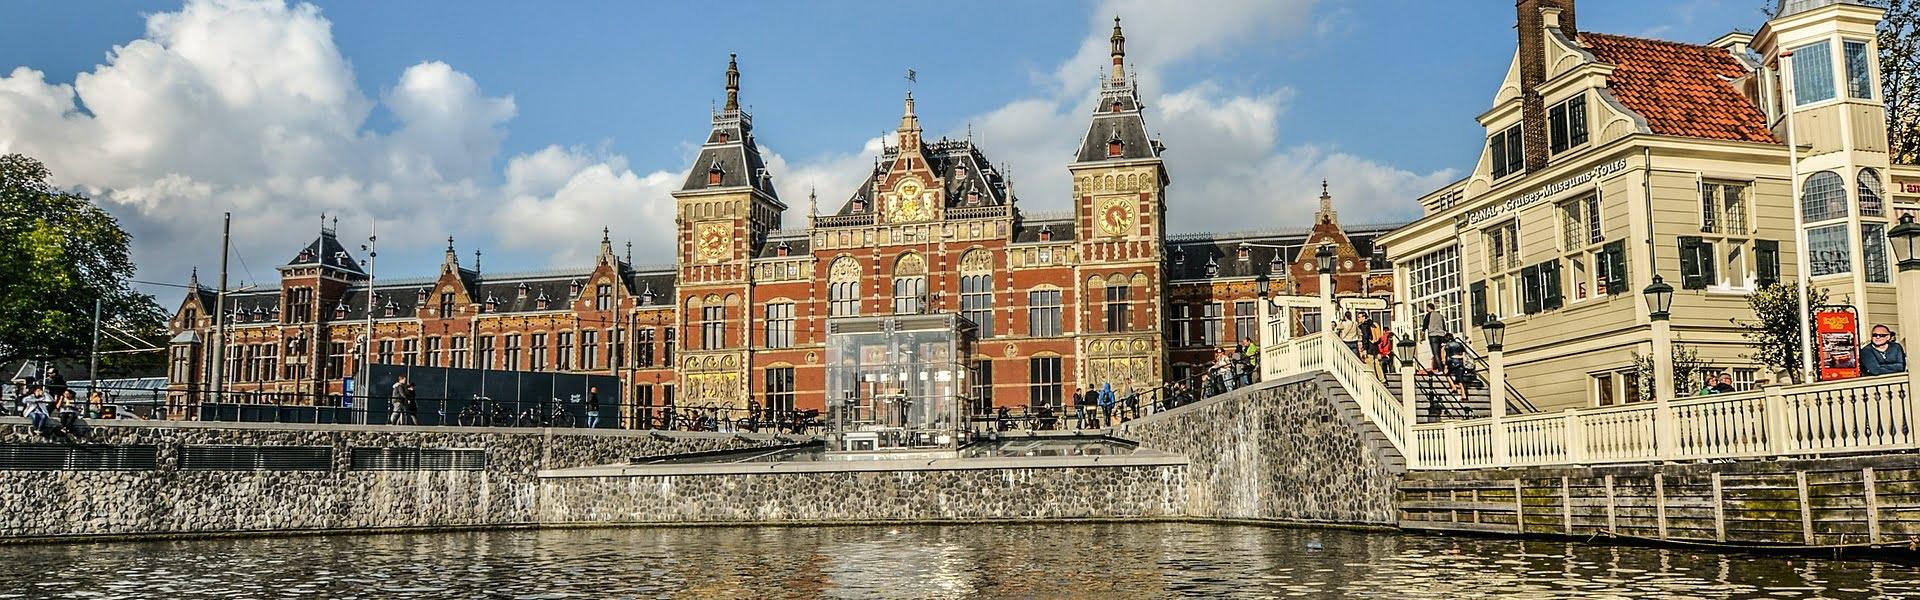 Nederland | Inspirerend Amsterdam